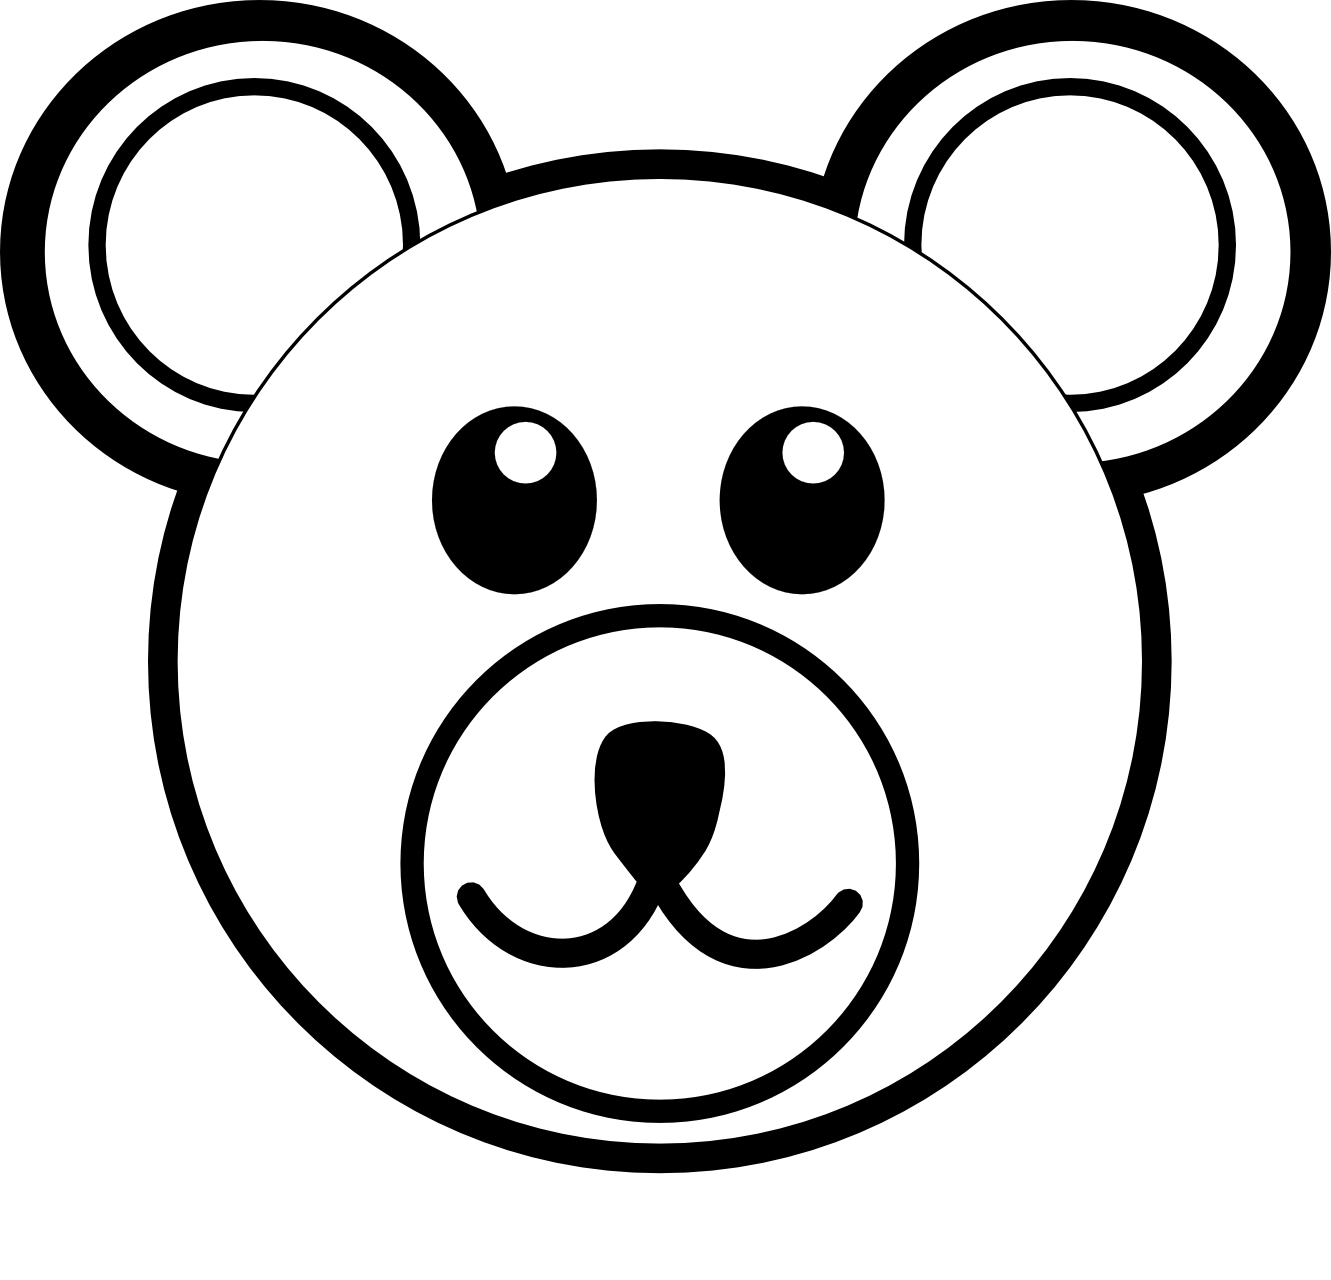 Clip Art: Bear 3 Head Brown Black White Line Art ... - ClipArt Best ...